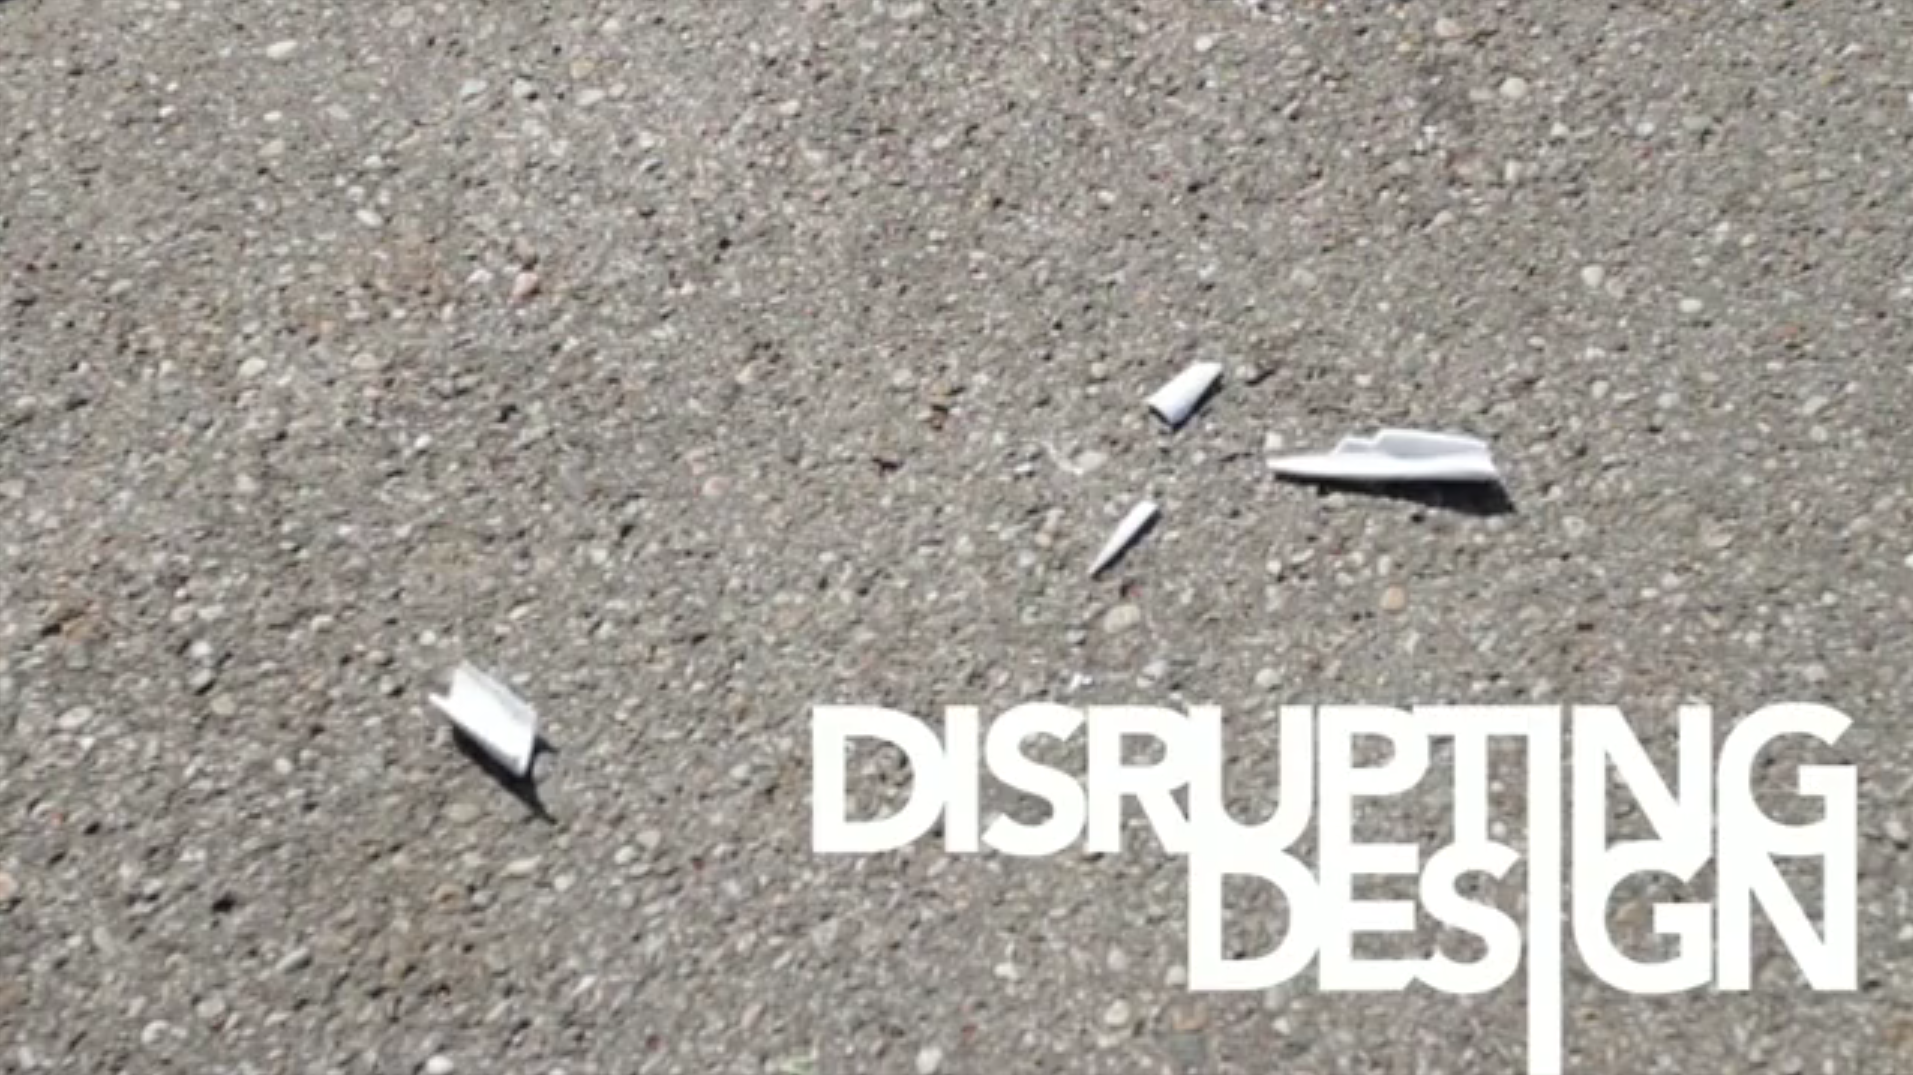 2051 disrupting design